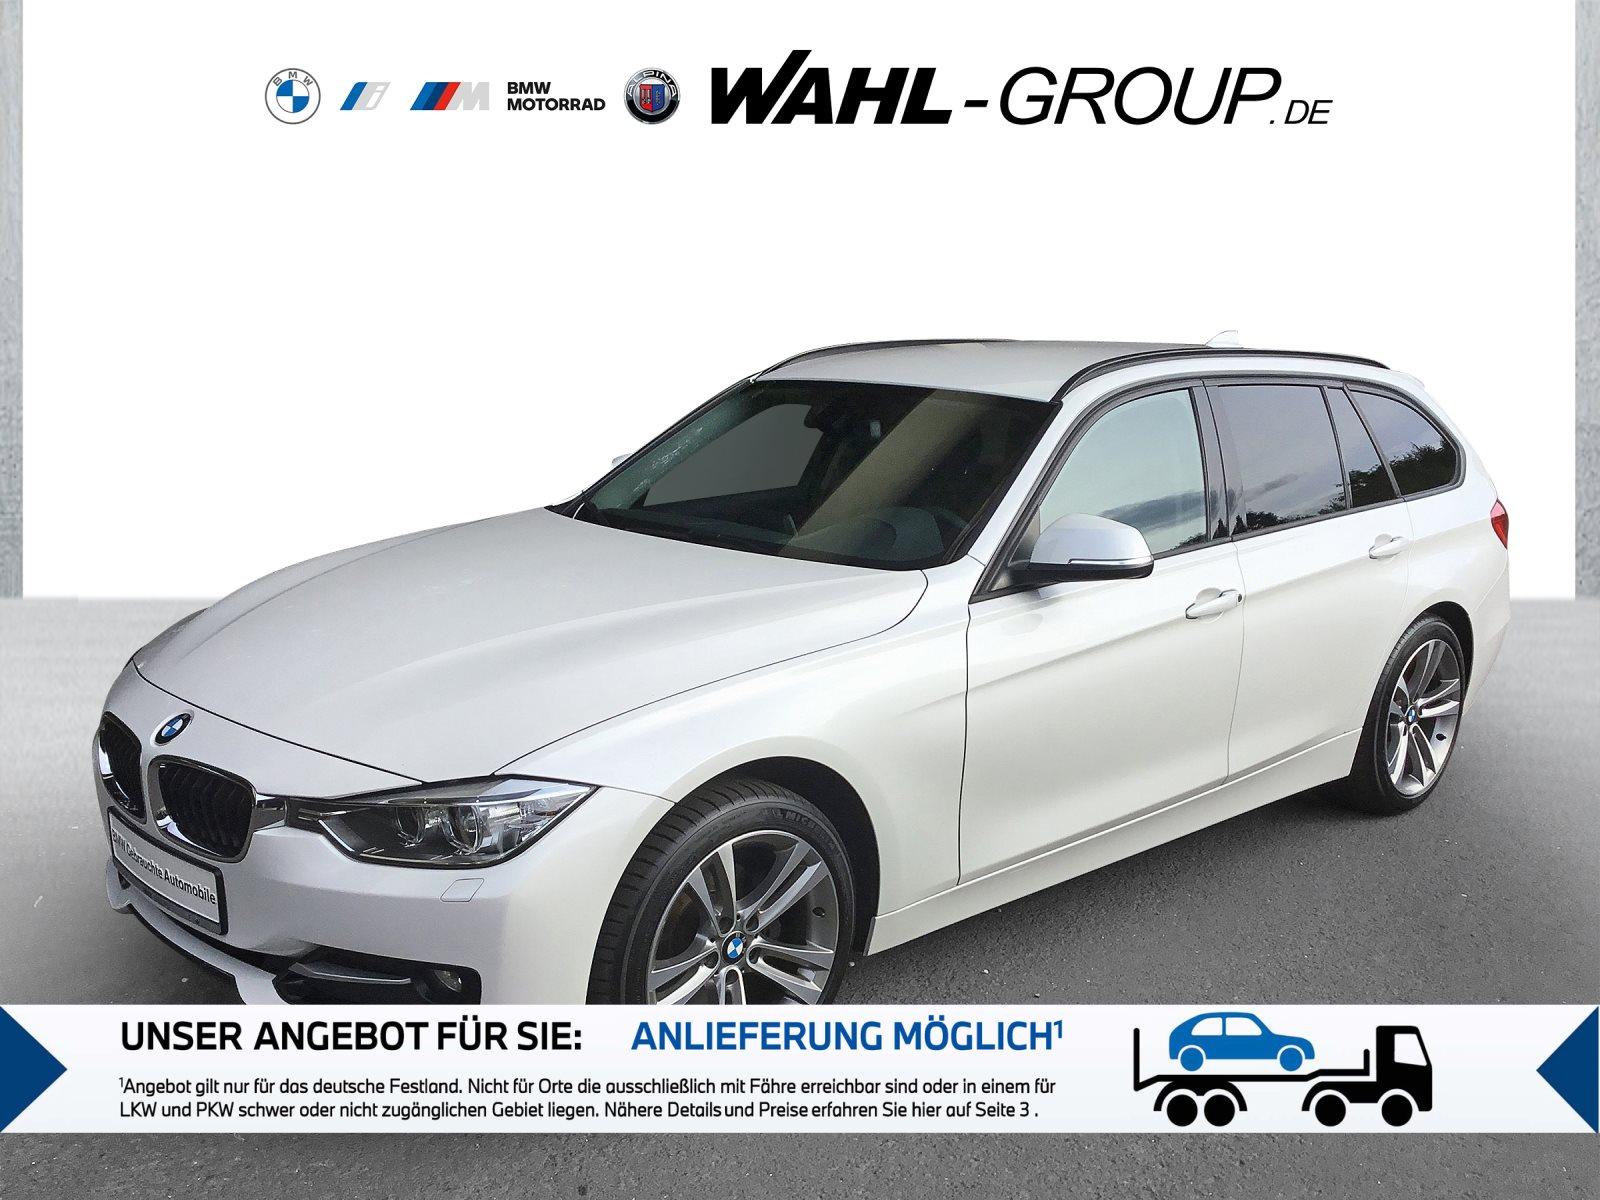 BMW 320d xDrive Touring Sport Line Xenon Navi Business, Jahr 2013, Diesel